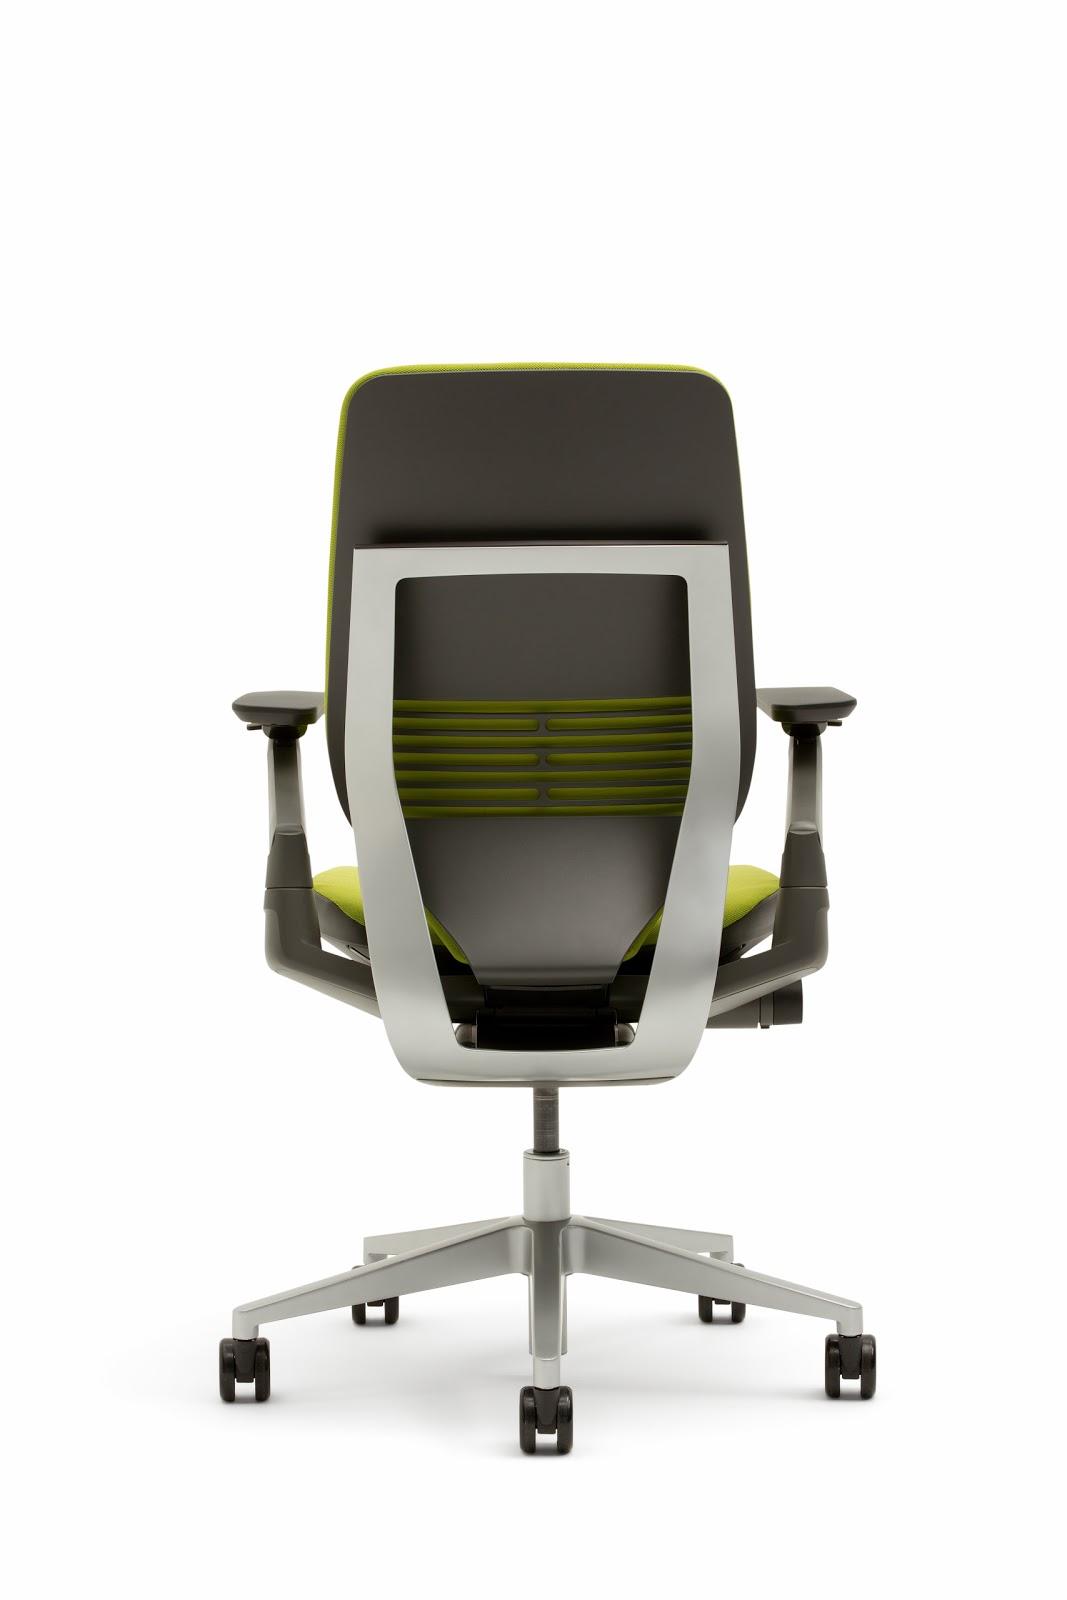 ergonomic chair là gì folding rocking in a bag design decor and disha an indian blog